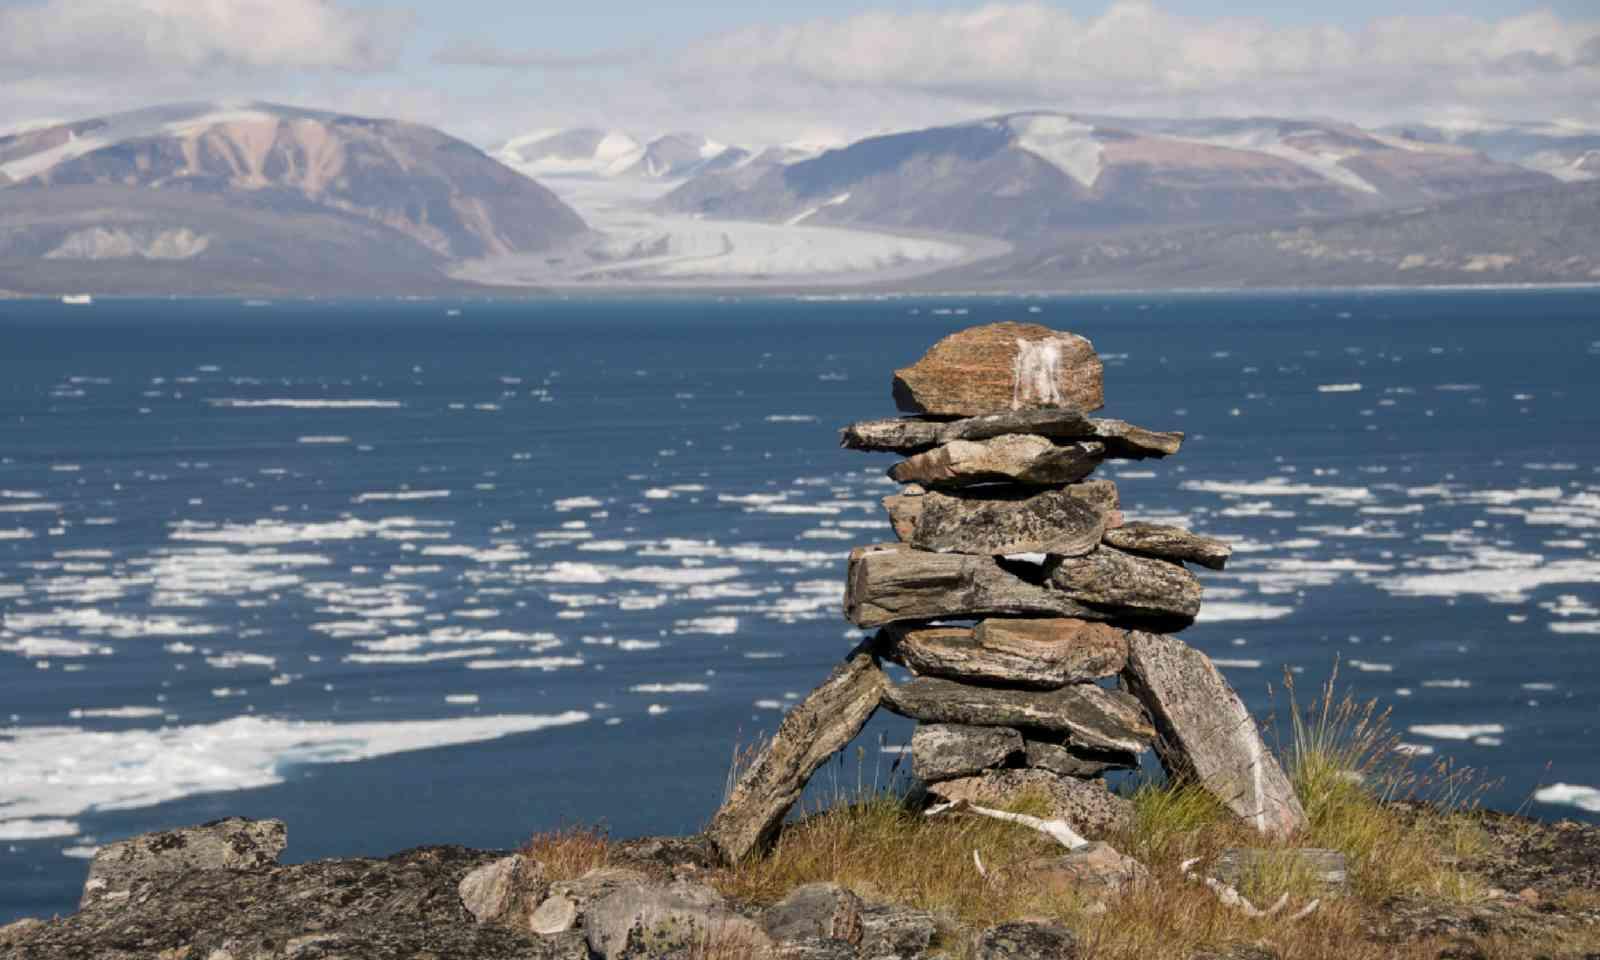 An ancient Inuit inukshuk serves as a landmark for seafarers (Shutterstock)